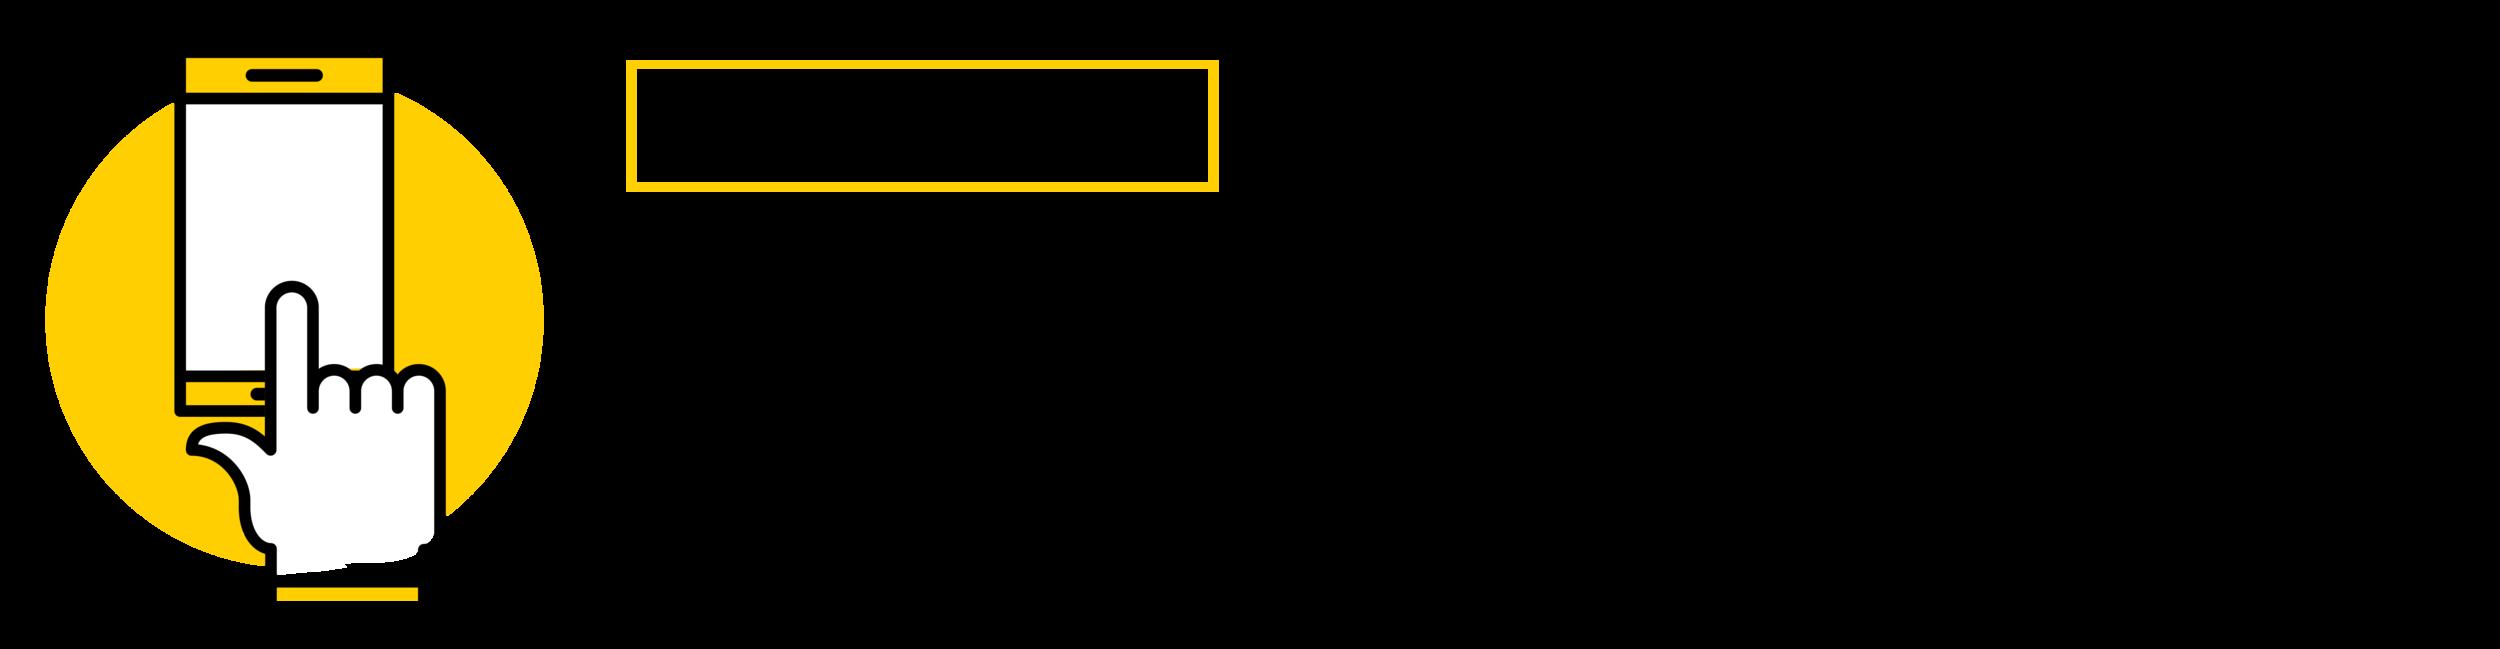 Online Ordering_web banner.png